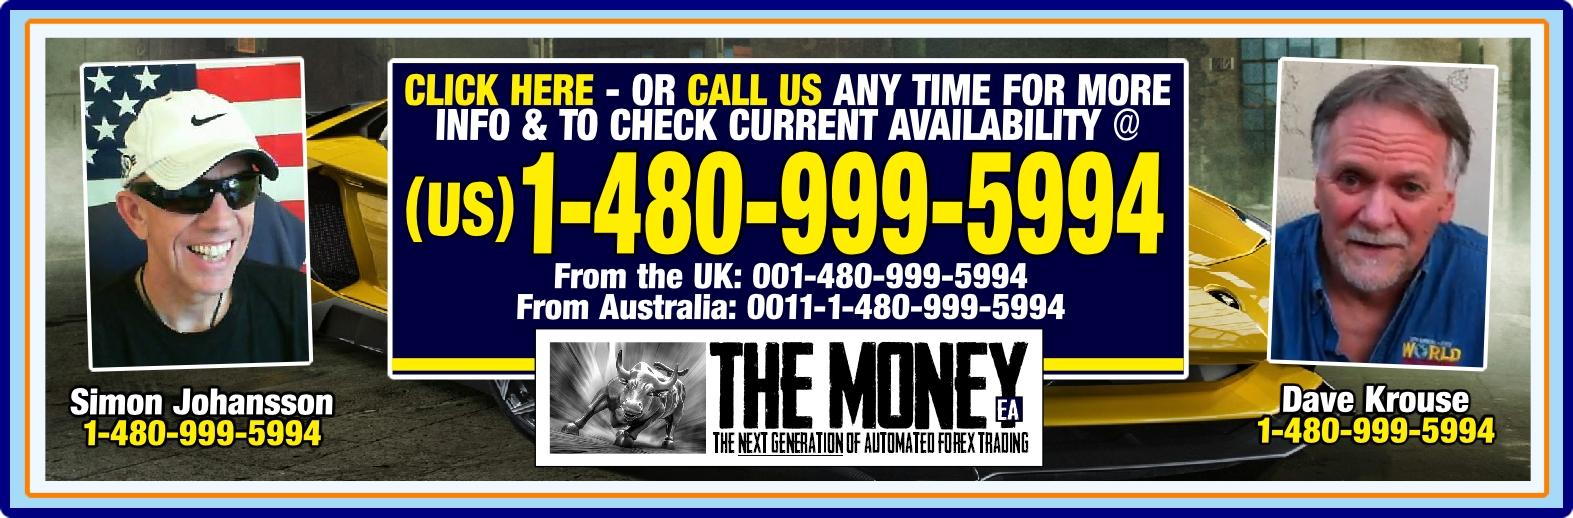 v7 call dave and SJ for more info the money ea expert advisor forex